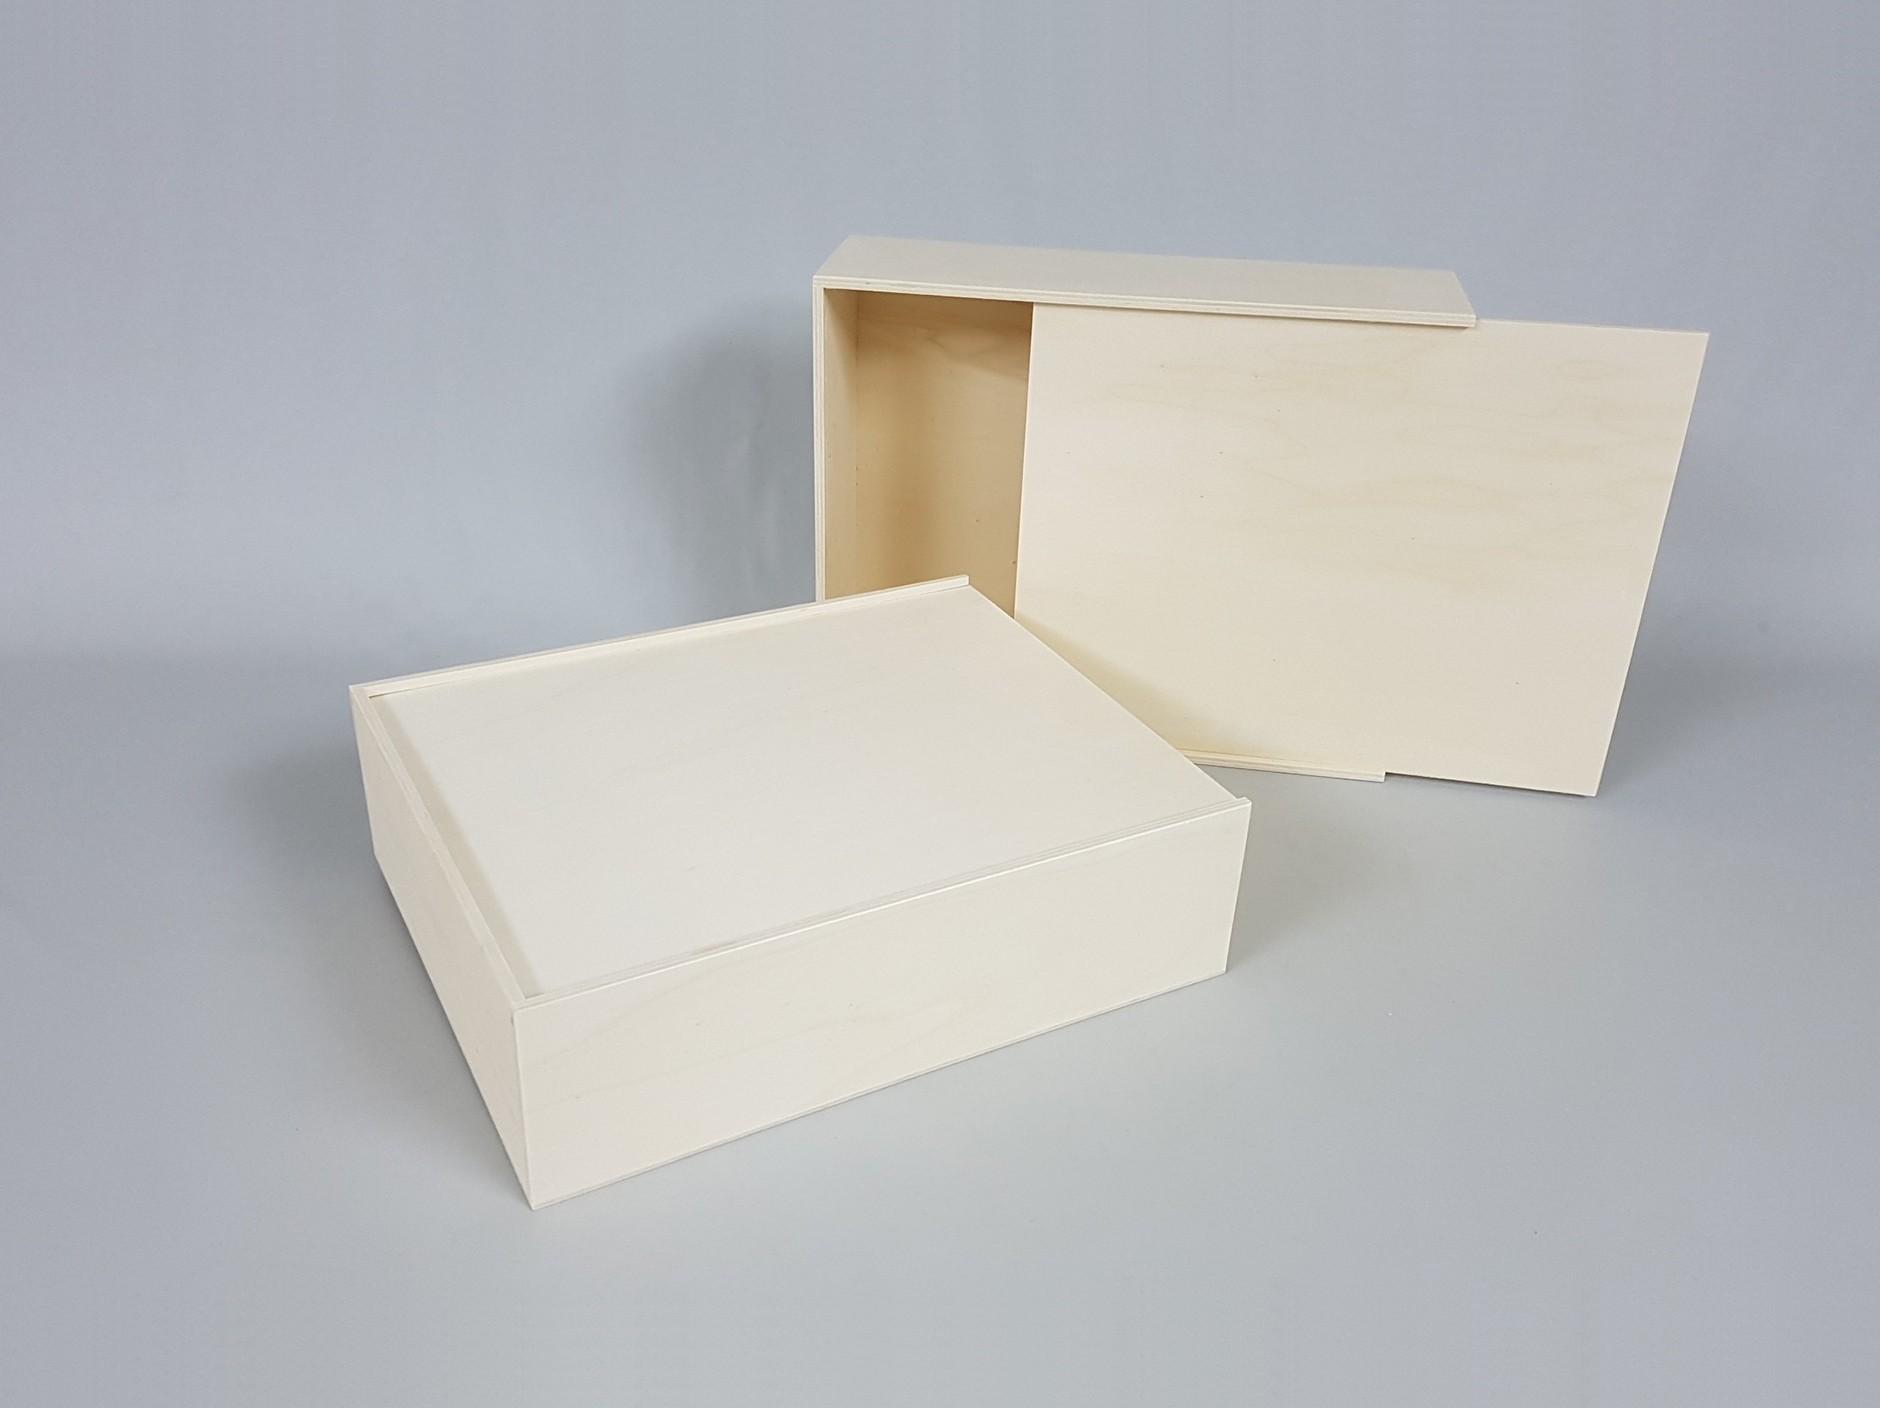 Wooden box 35x28x10 cm. with sliding lid Ref.P1454C8J